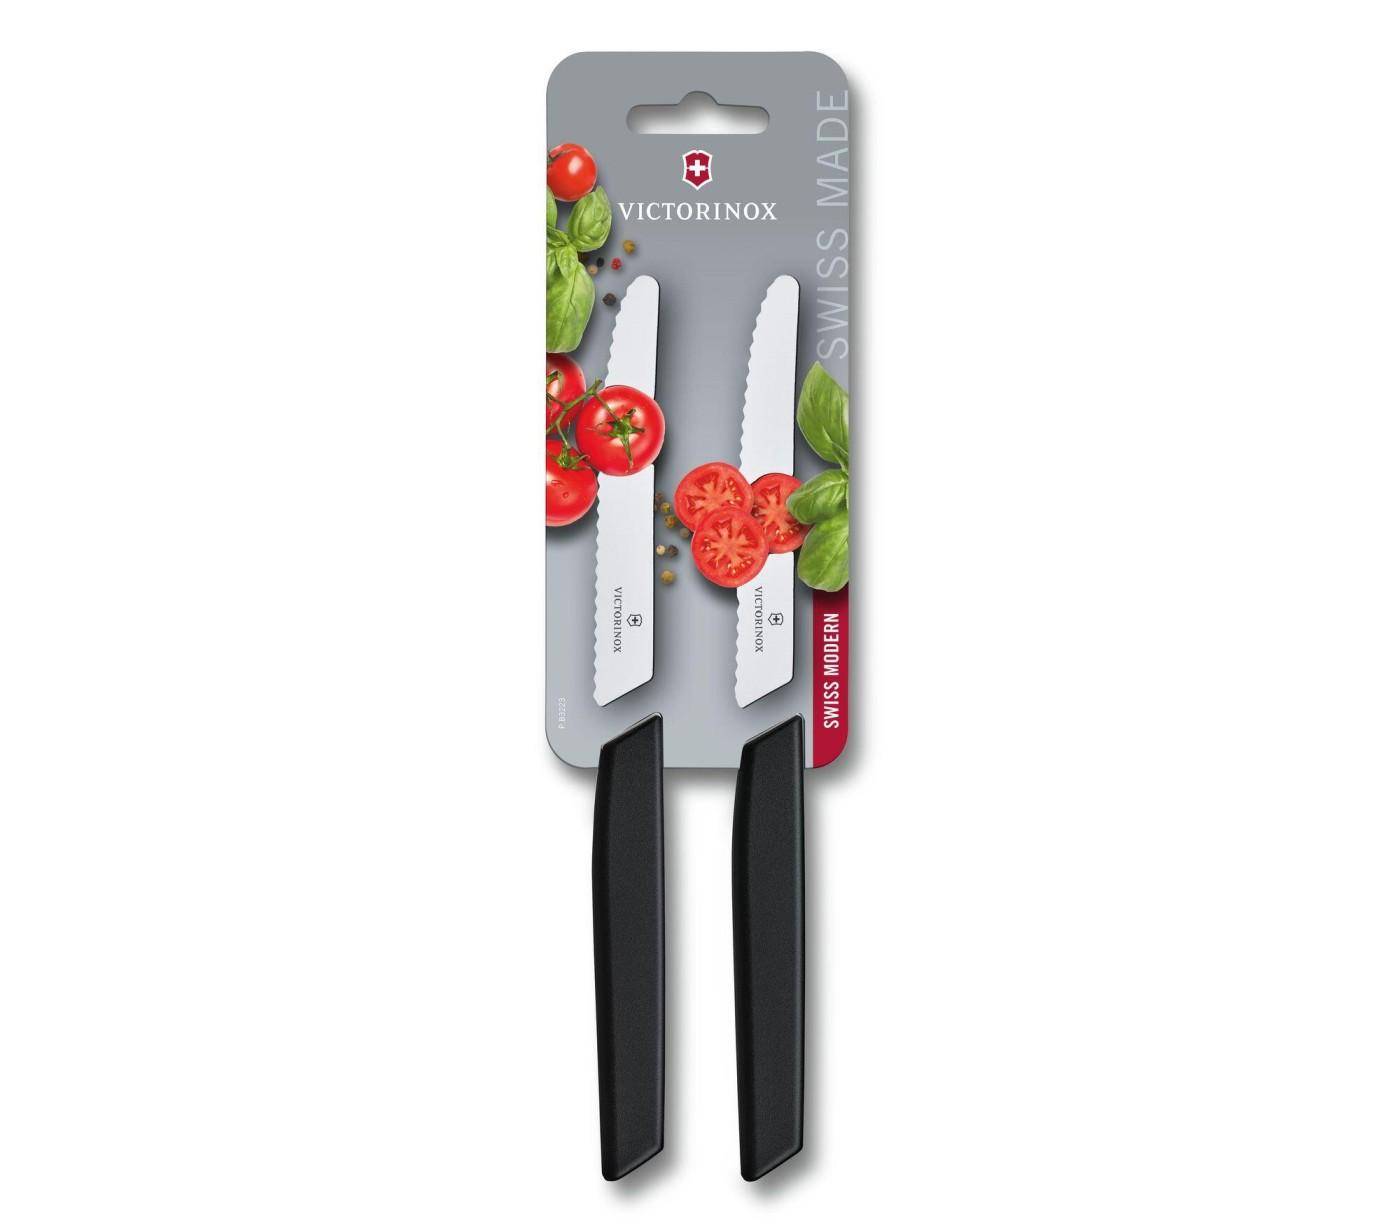 Sada 2 ks Nůž na rajčata SWISS MODERN 11 cm černý - Victorinox